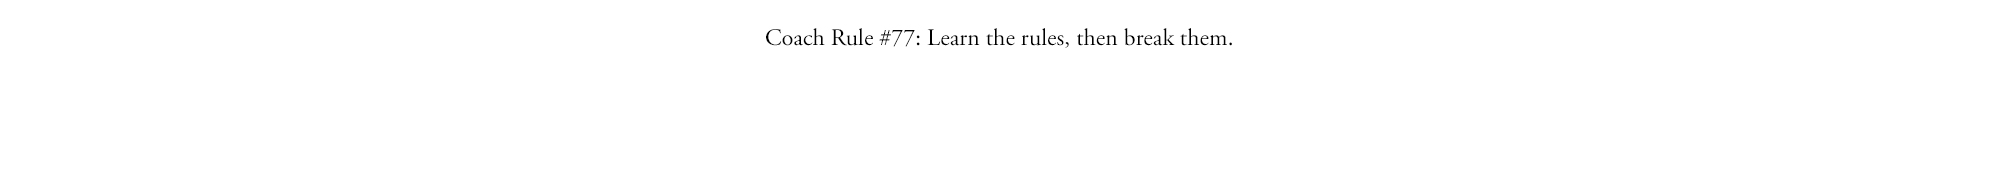 Coach Rule